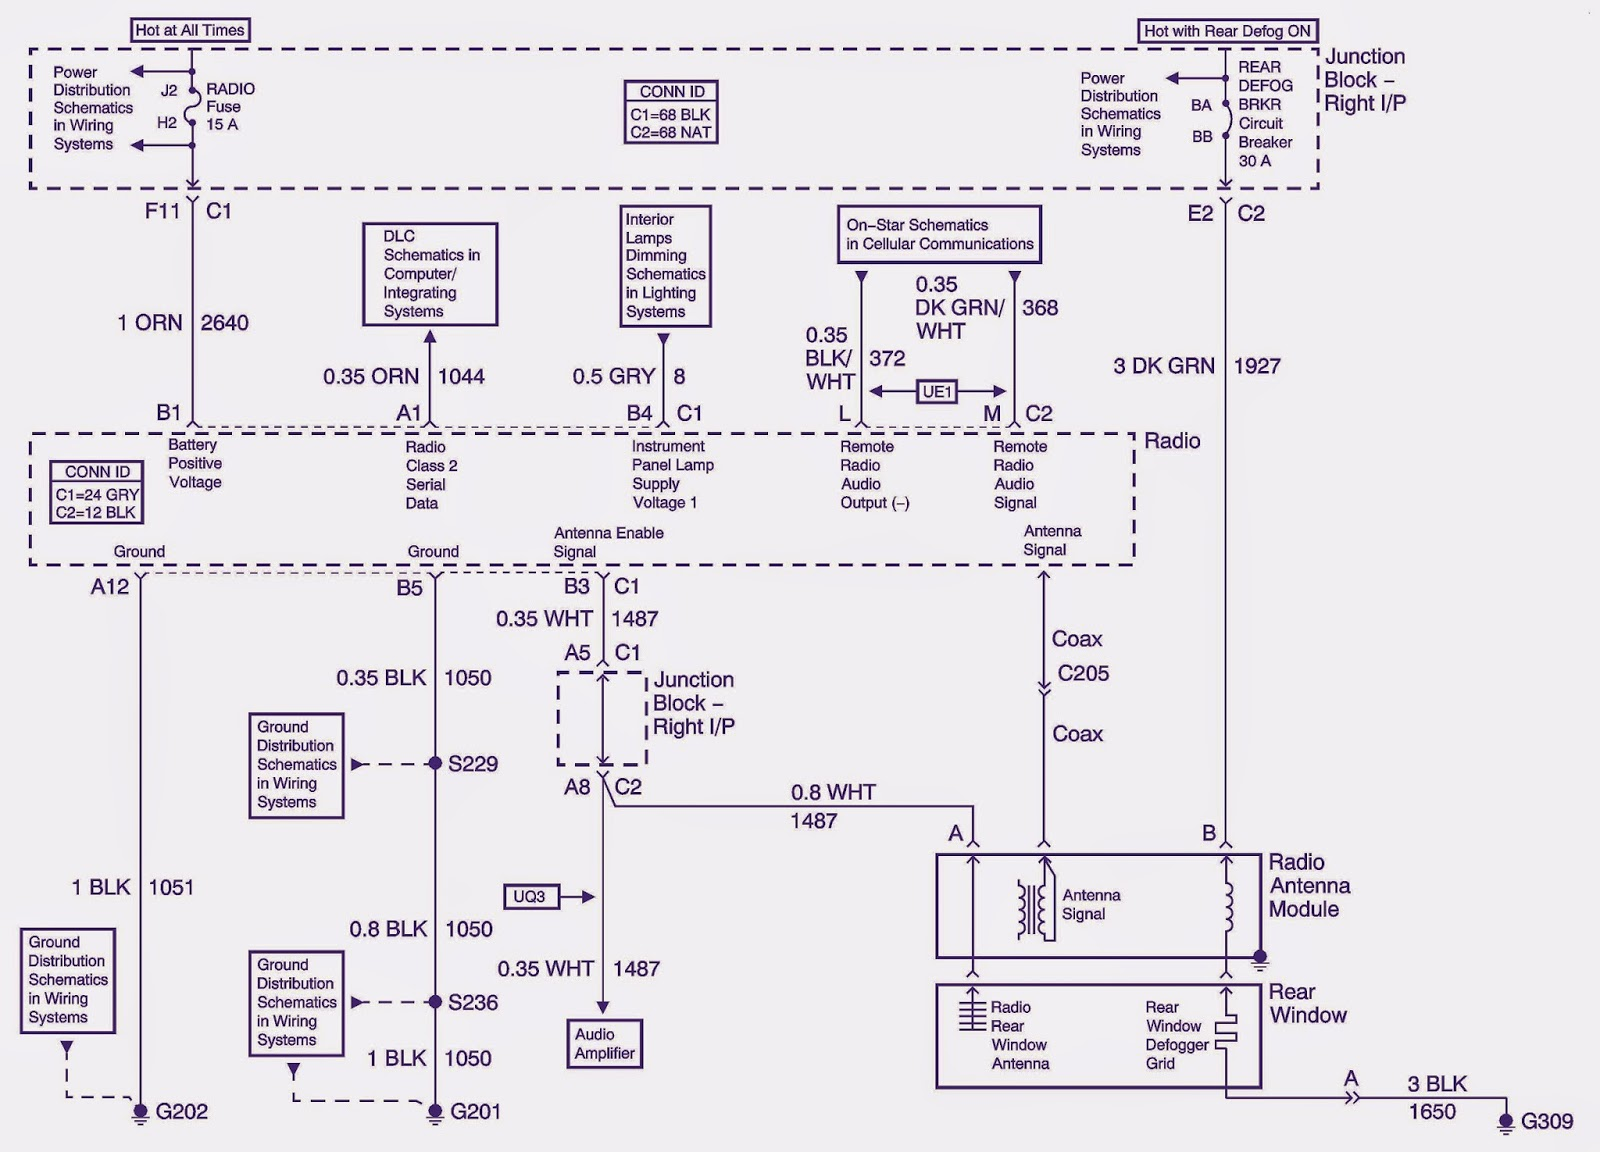 Chevrolet cobalt stereo wiring diagram 460 ford engine wiring Chevy Cavalier Wiring Diagram 2003 Chevy Cavalier Stereo Wiring Diagram Chevy S10 Wiring Diagram on 2003 chevy monte carlo stereo wiring diagram